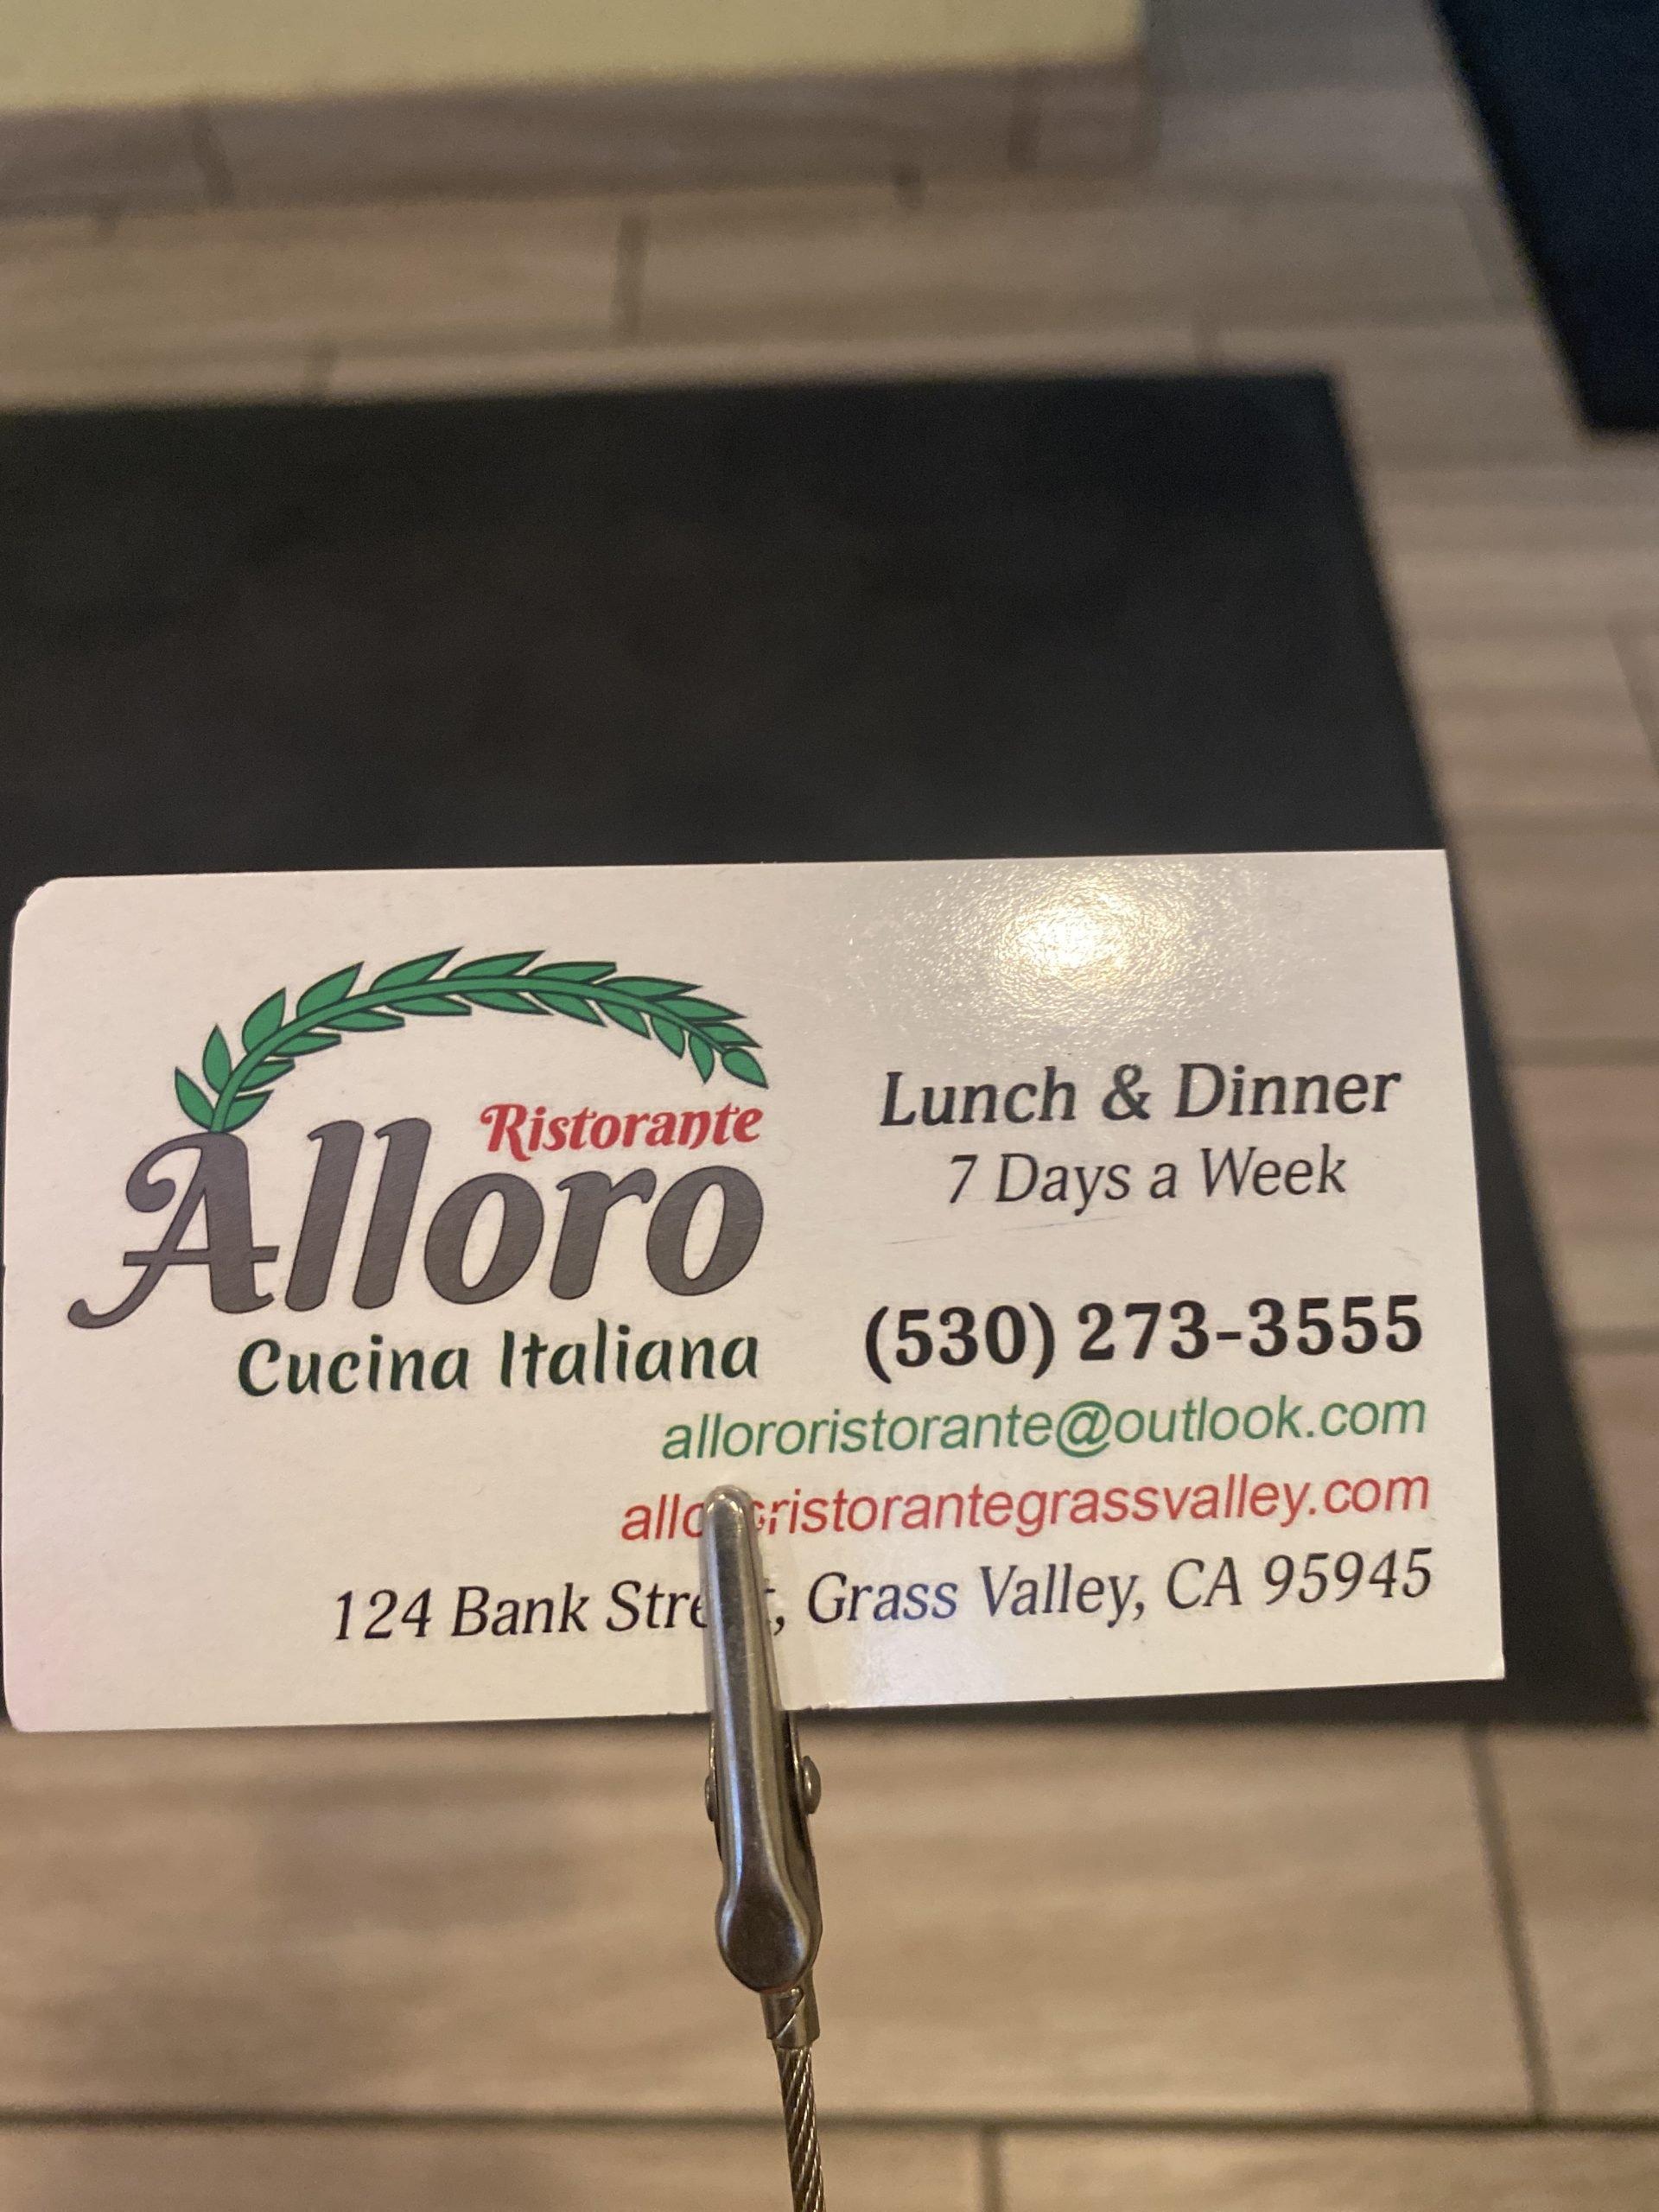 Alloro Cucina Italiana